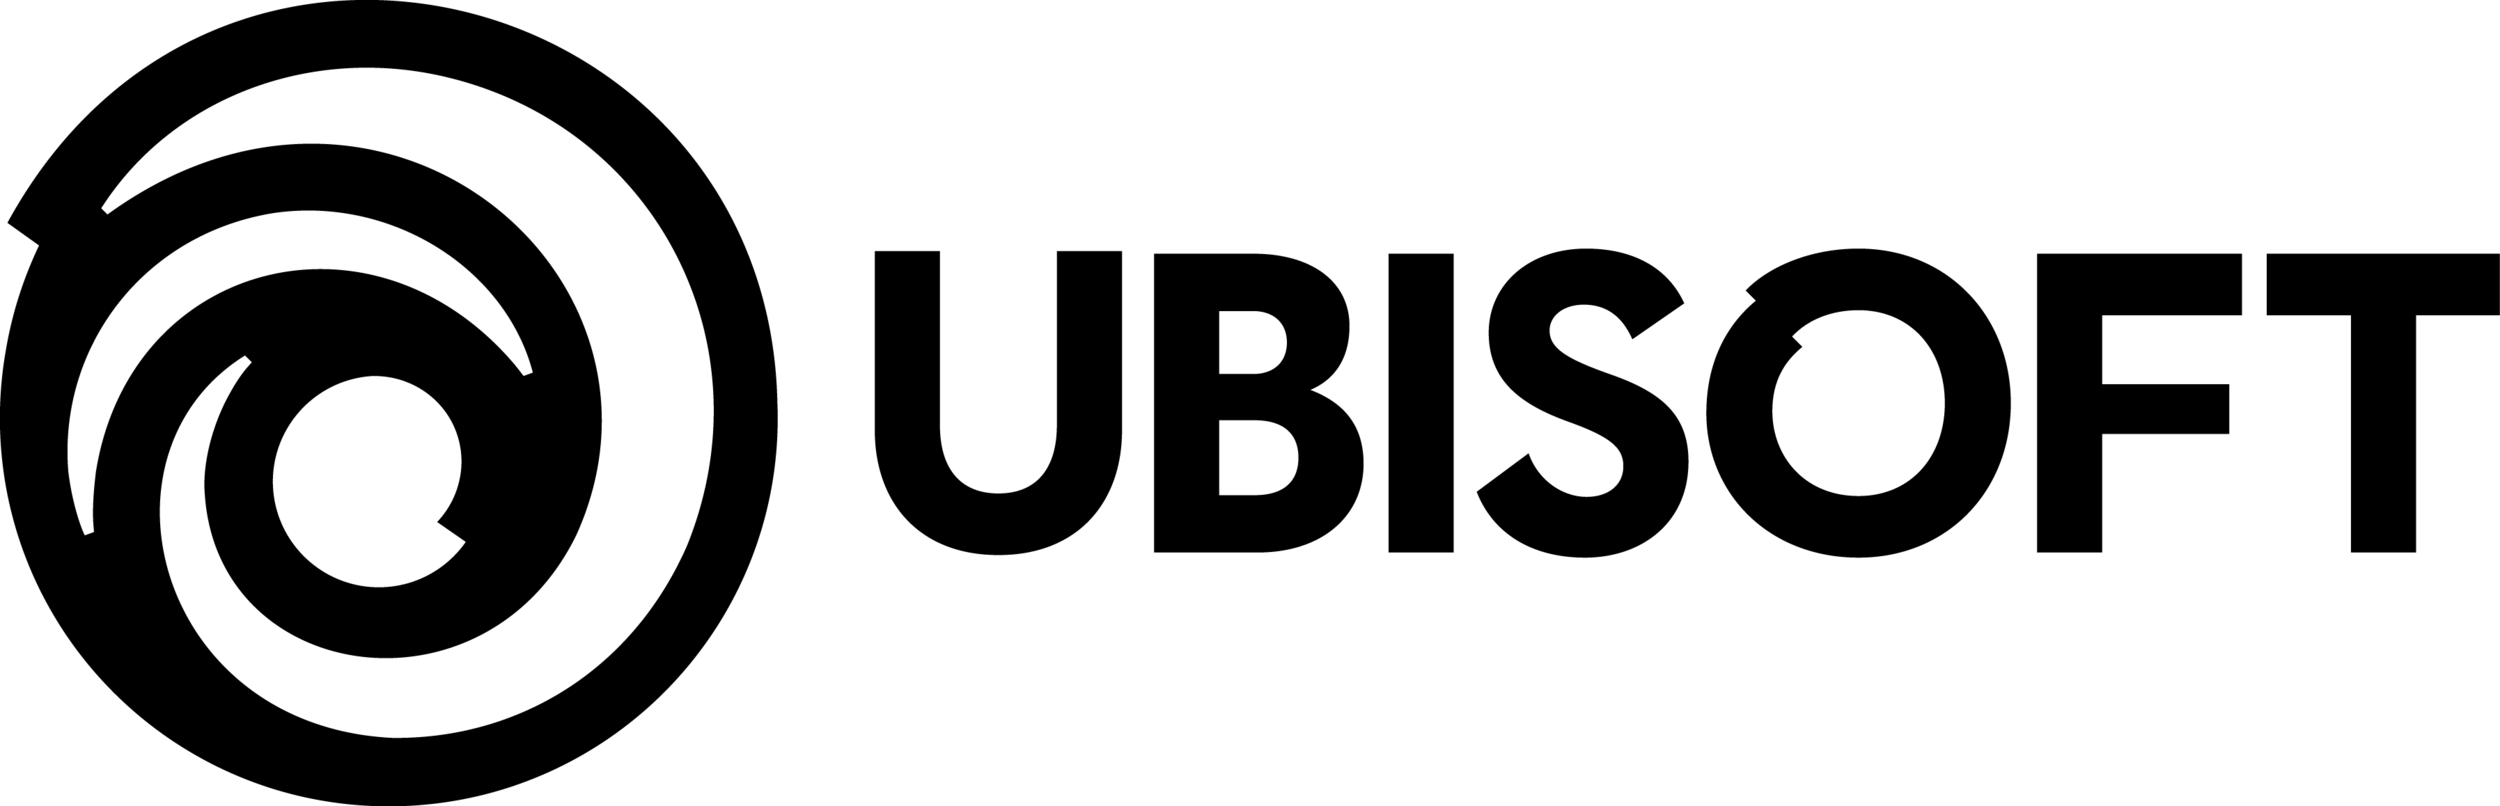 ubisoft-horizontal-logo-black.png